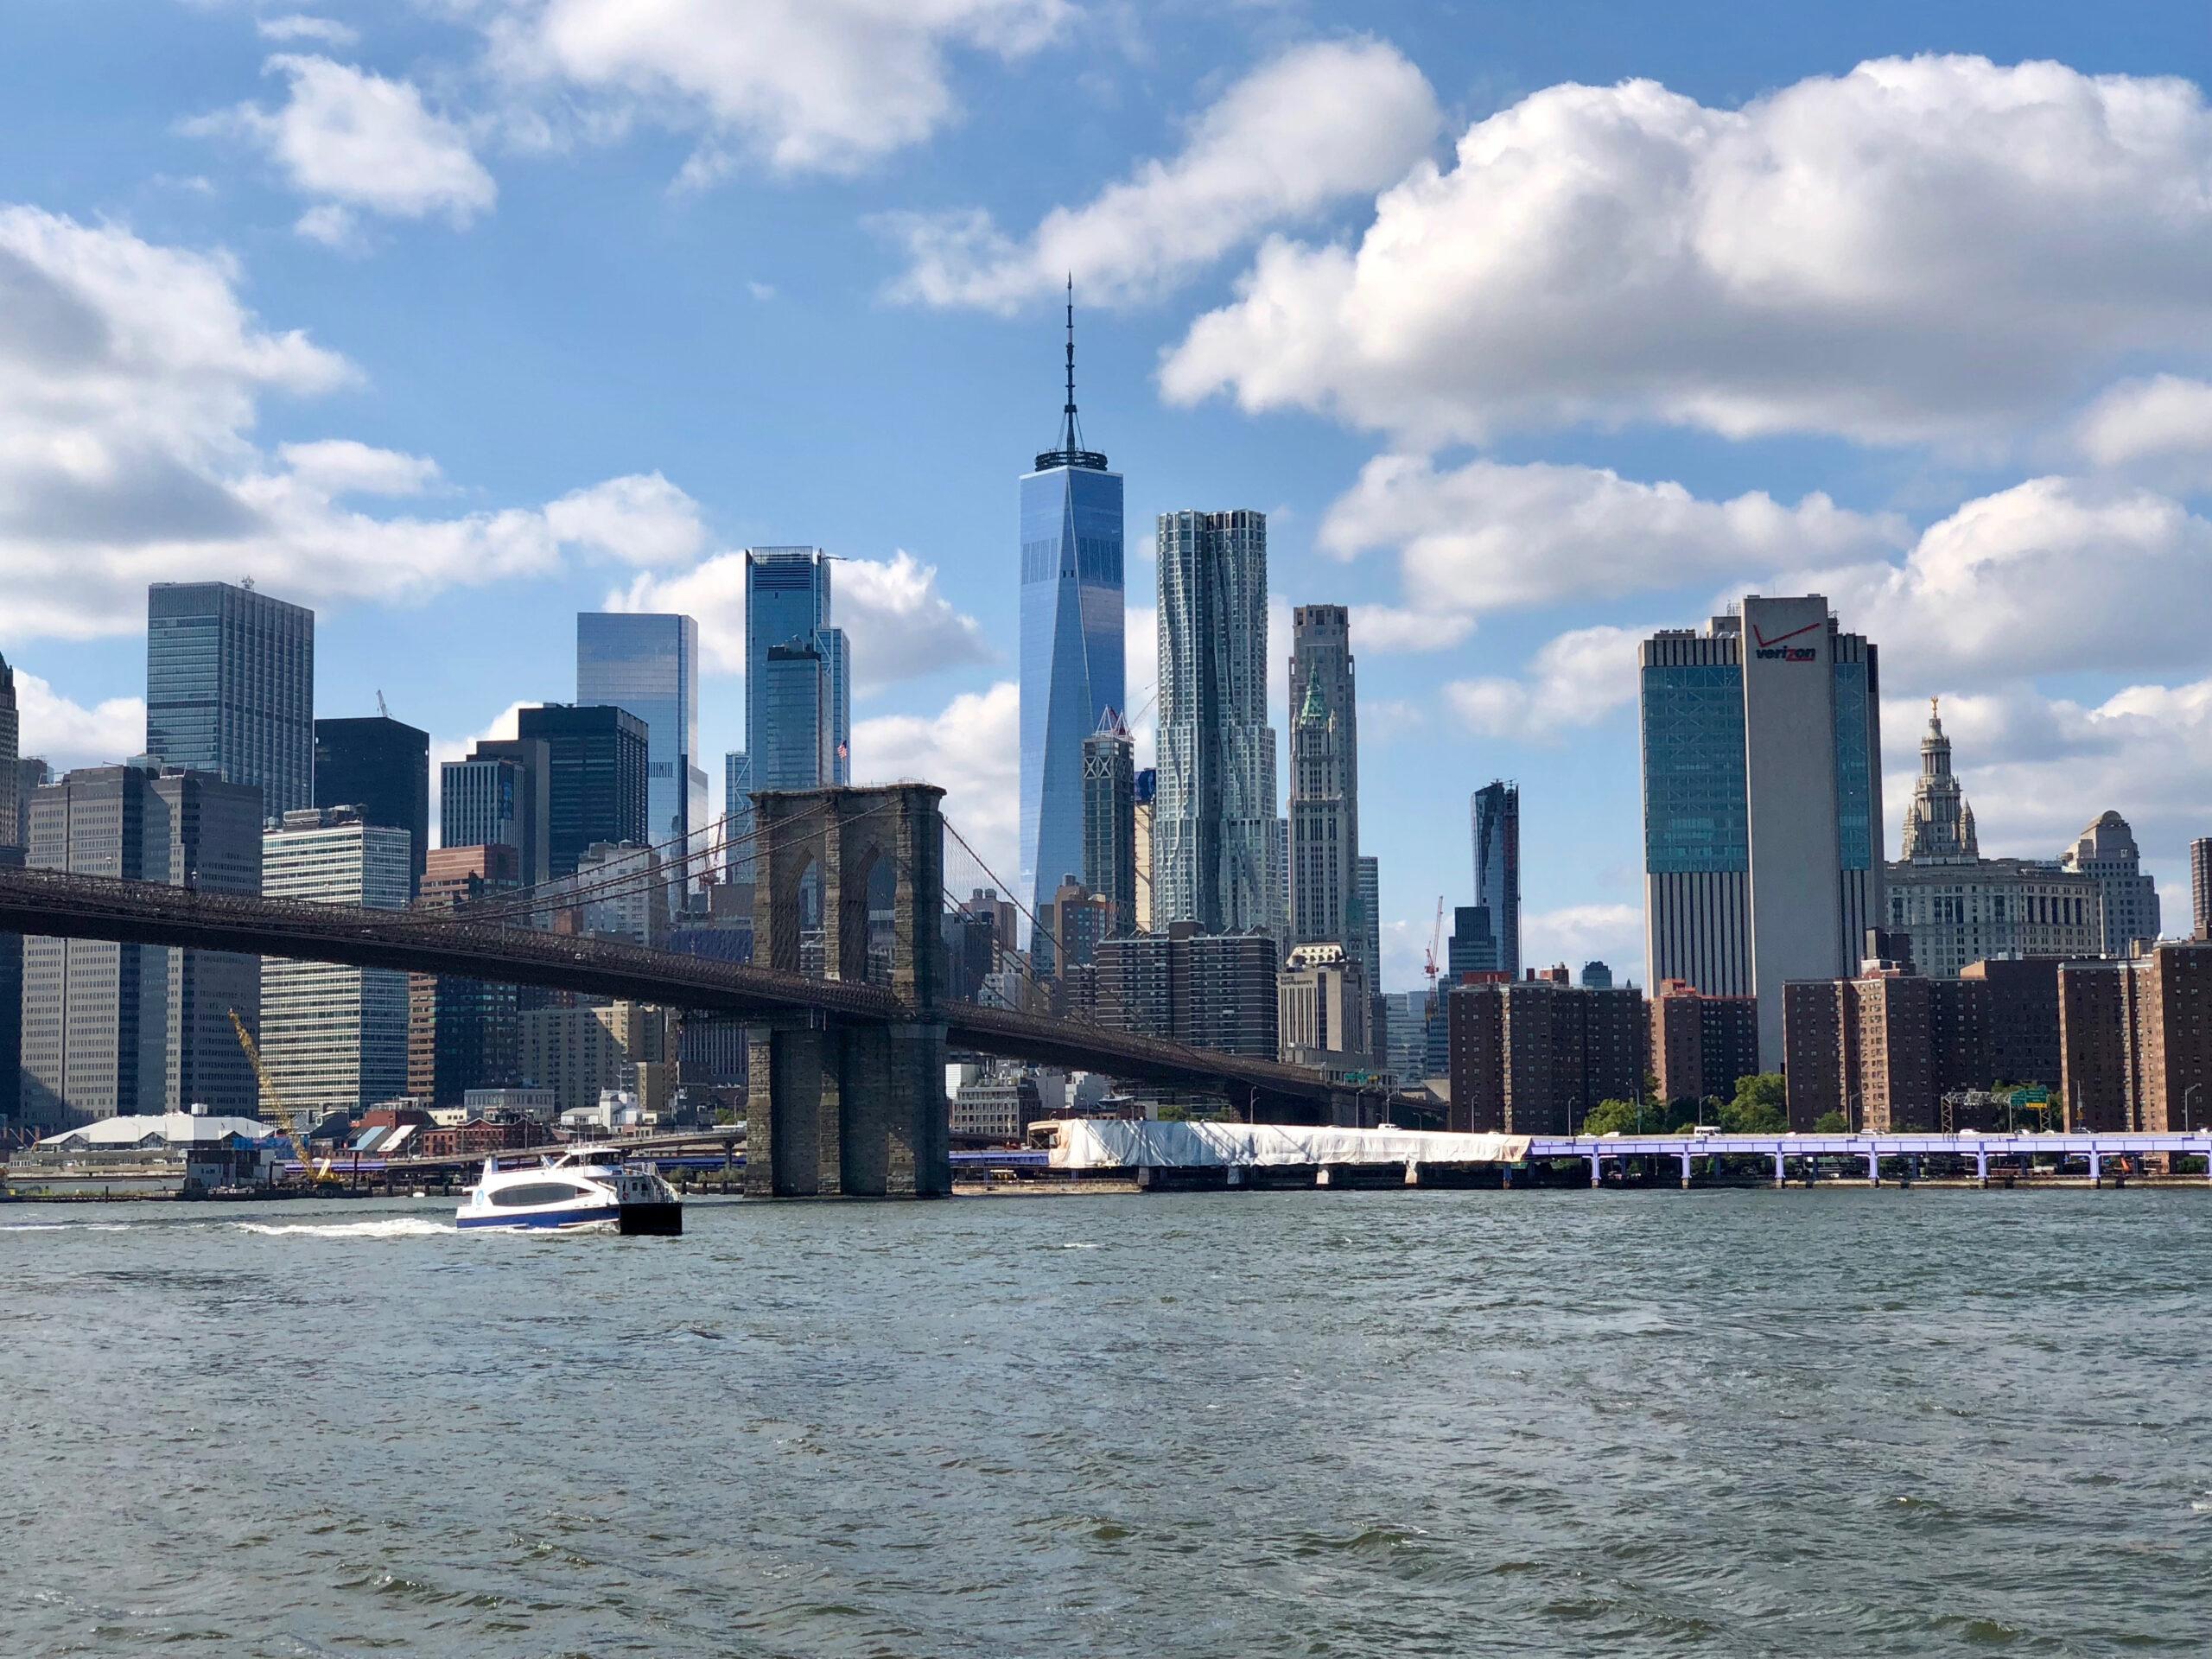 New York Ippressionen von Christian, Savory lens